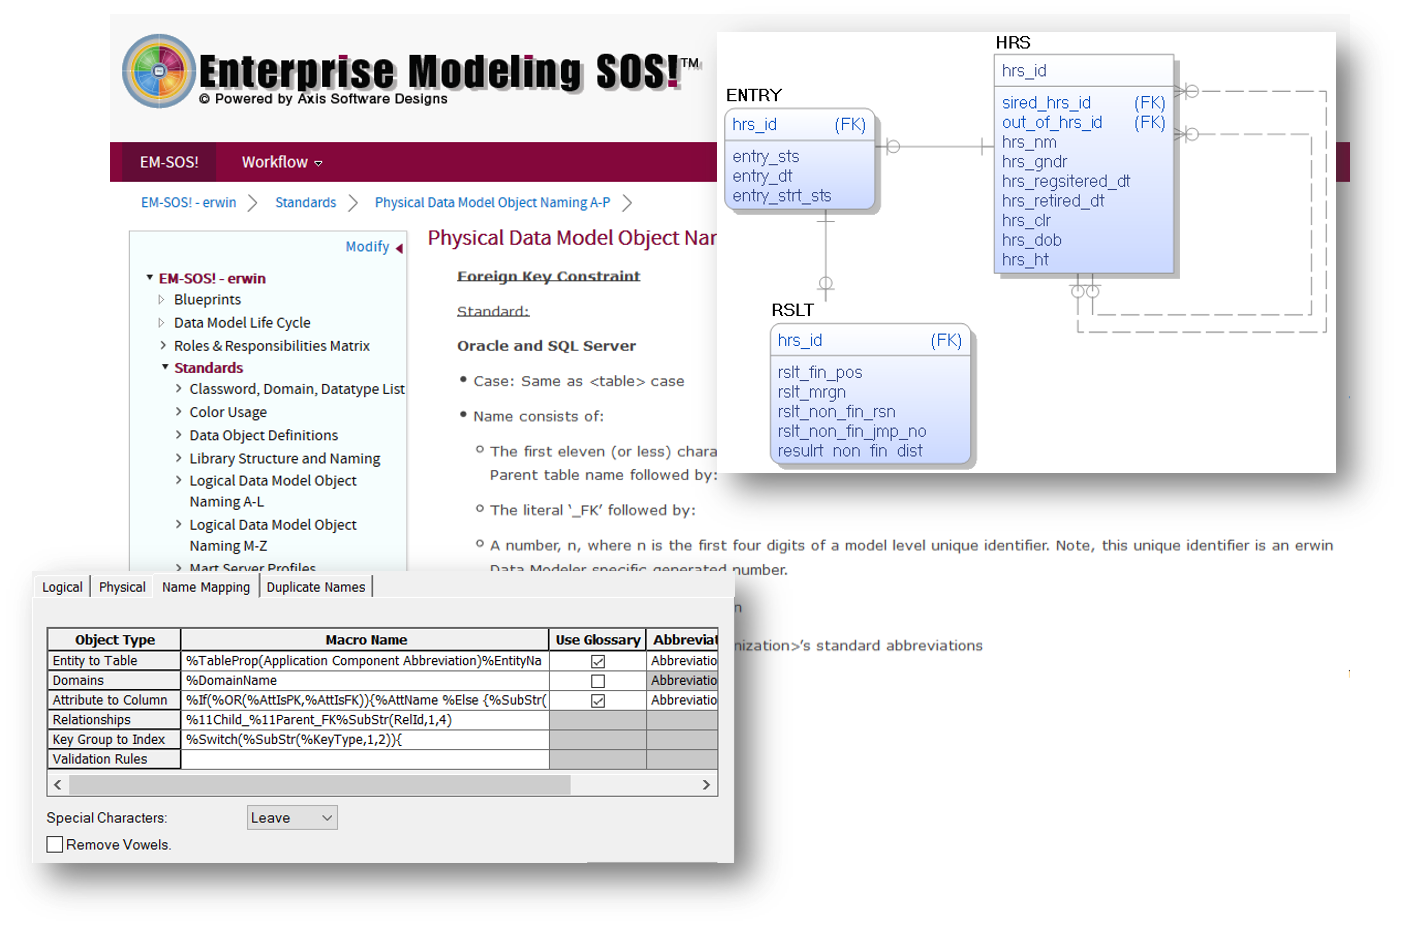 EM-SOS!™ 2.0 - Screenshot 2